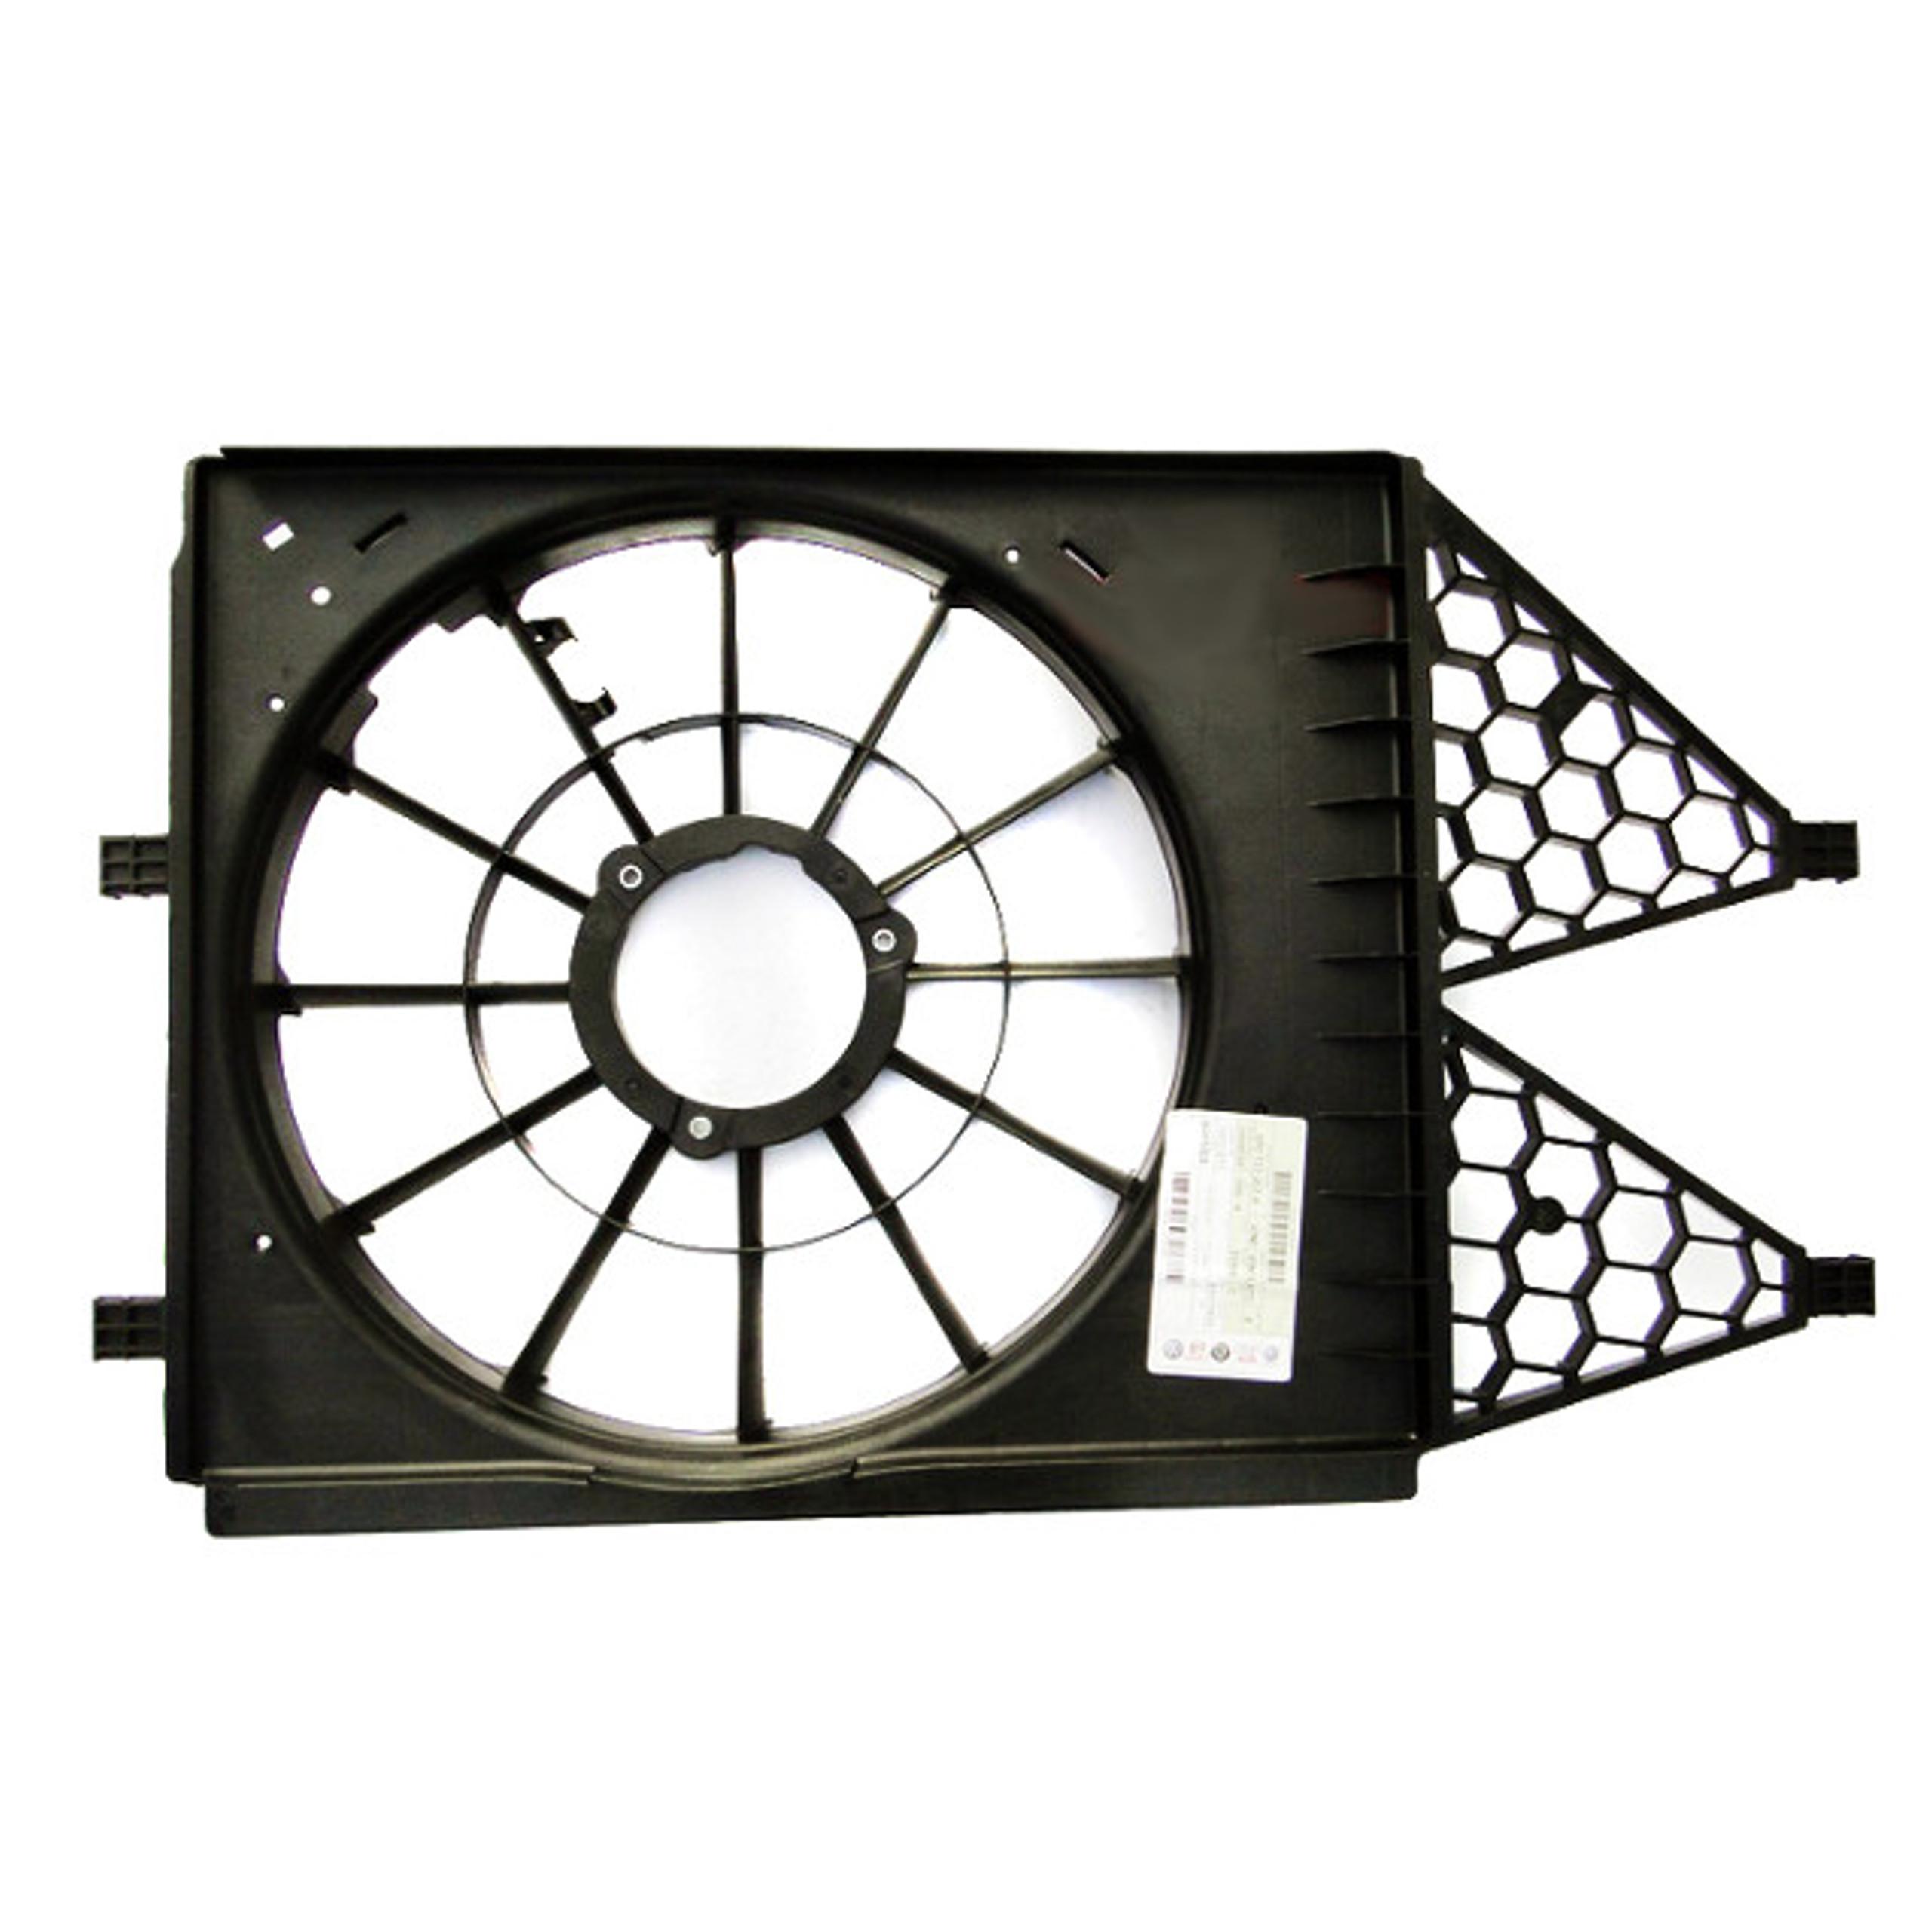 корпус вентилятора skoda rapid fabia ii 6r0121207